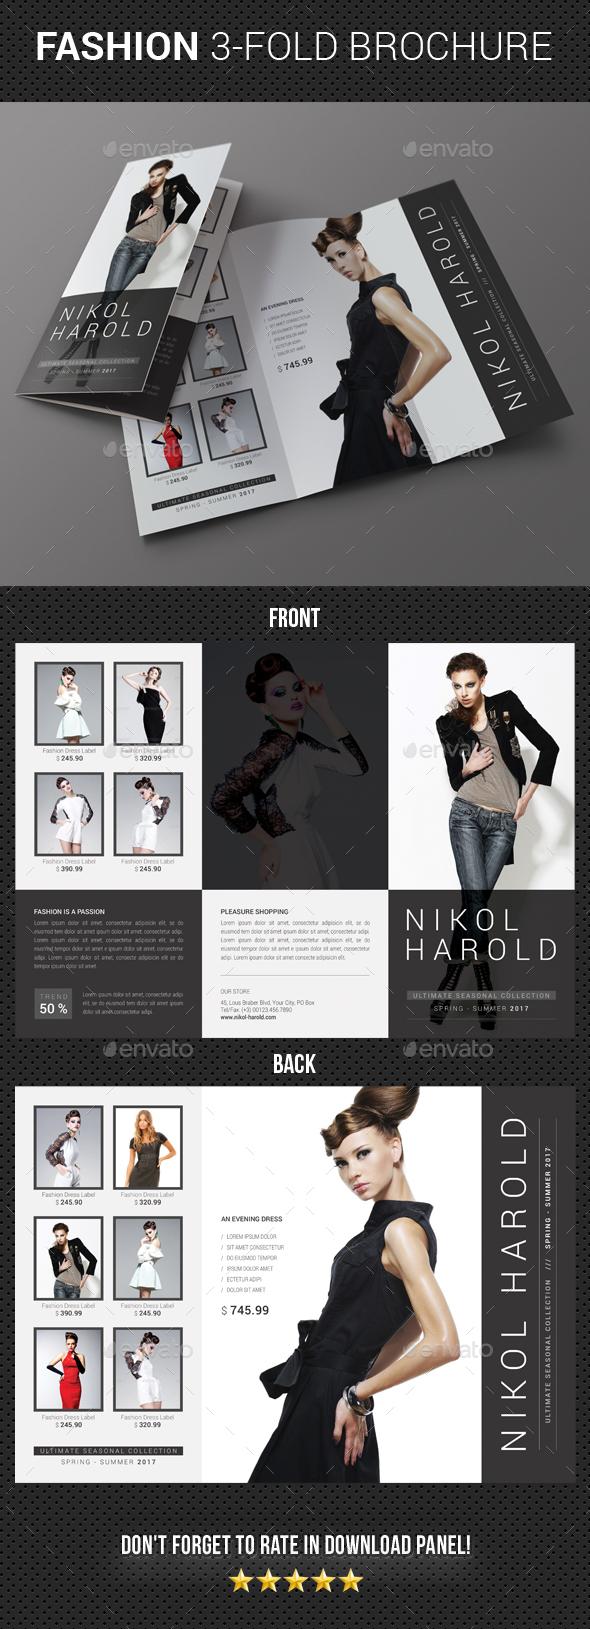 Fashion 3-Fold Brochure 19 - Brochures Print Templates